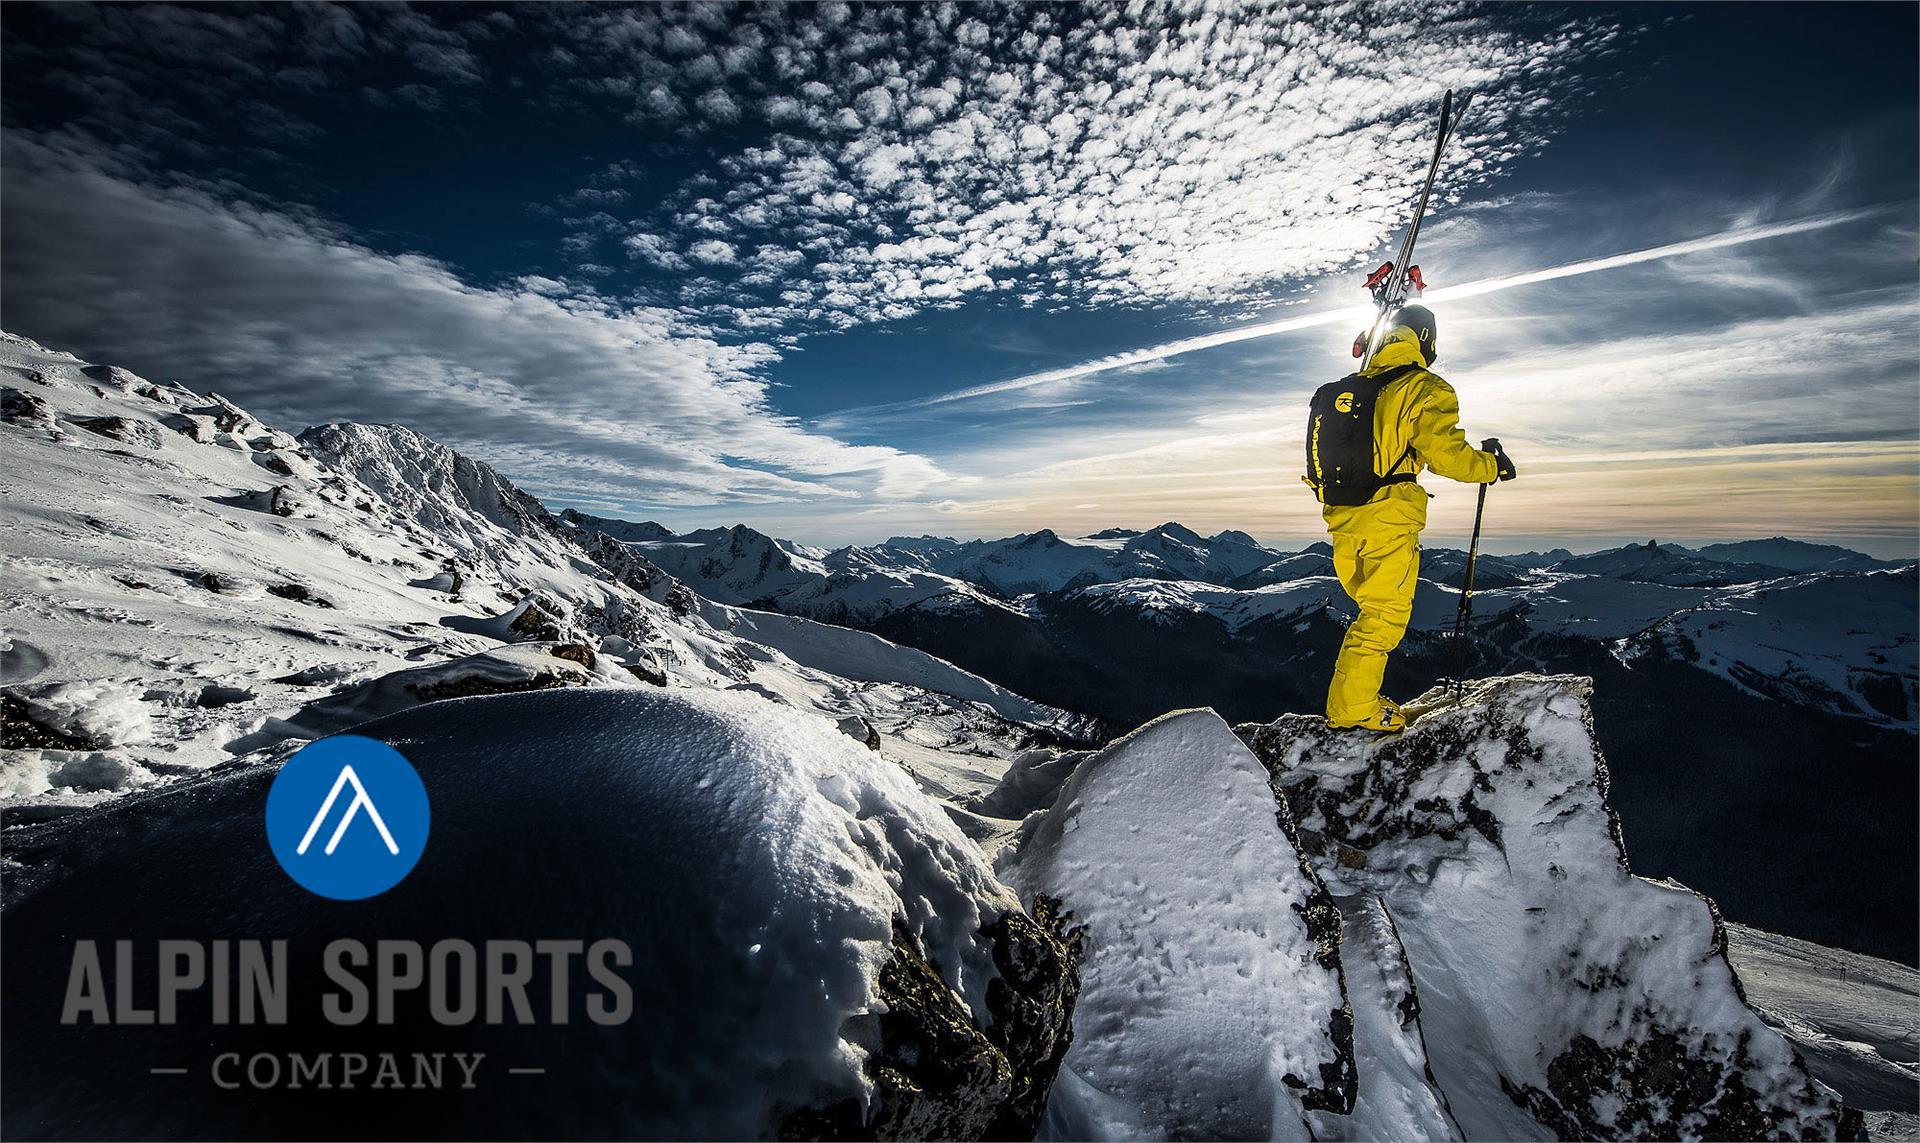 Alpin Sports Company Siusi/Seis